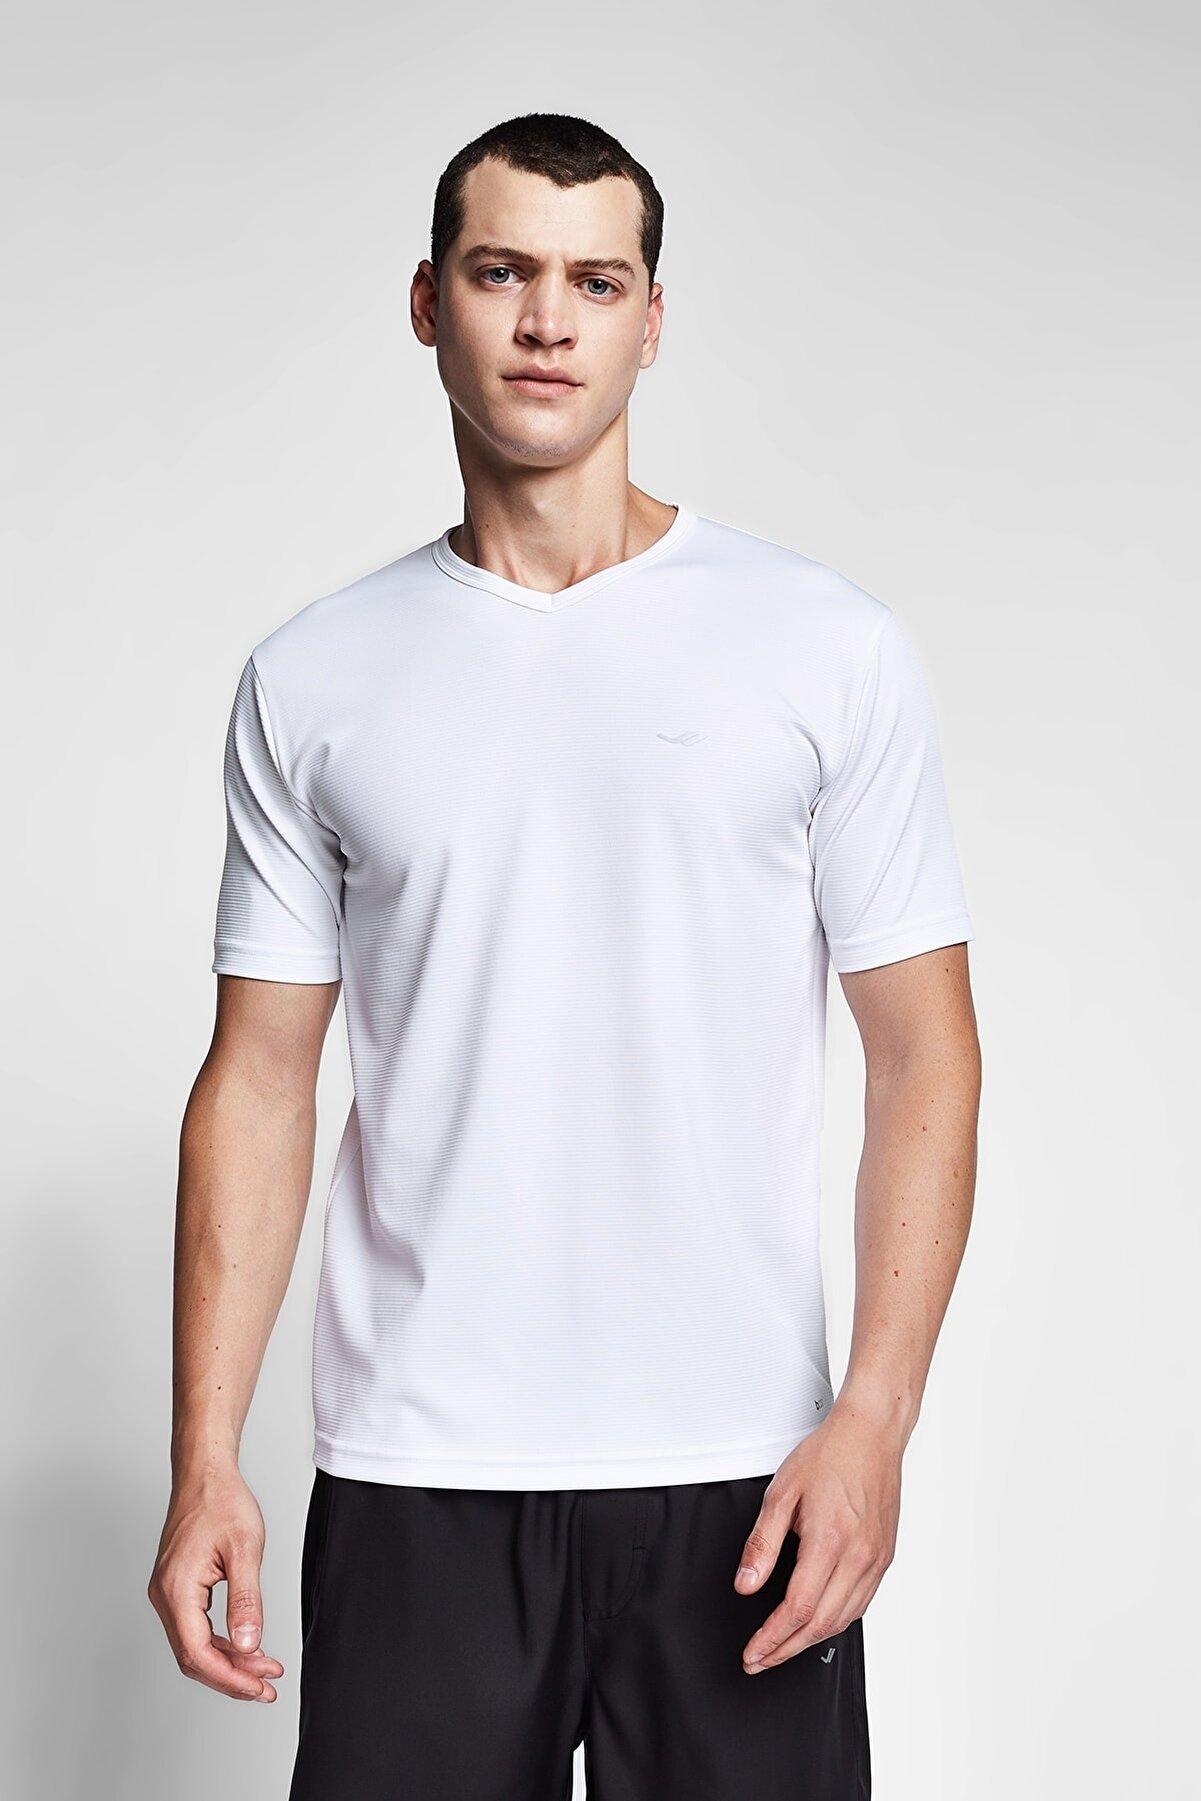 Lescon Beyaz Erkek T-shirt 20s-1231-20n